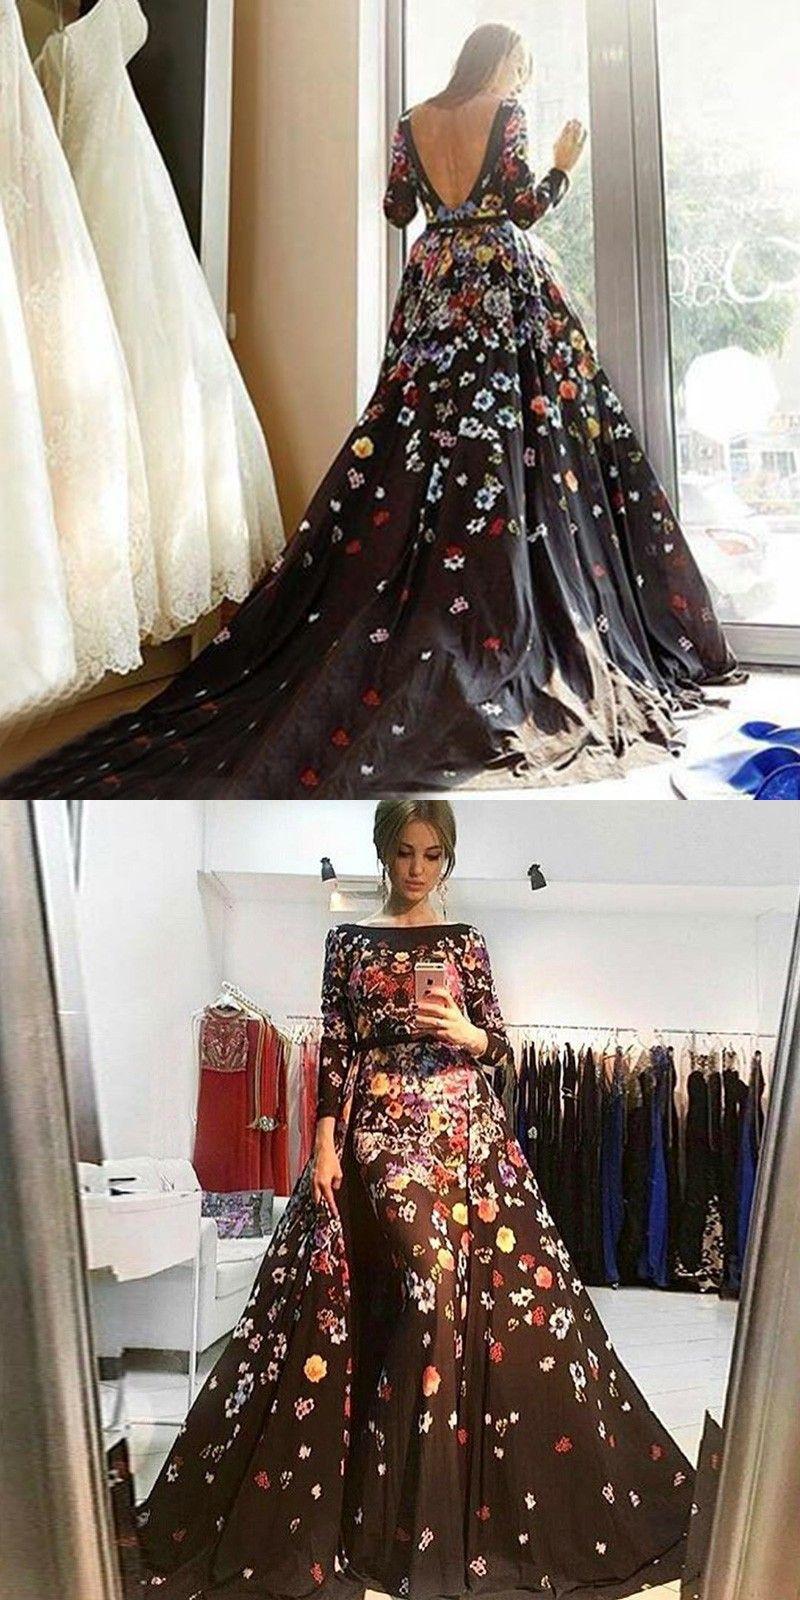 Aline bateau long sleeves backless long black floral prom dress in